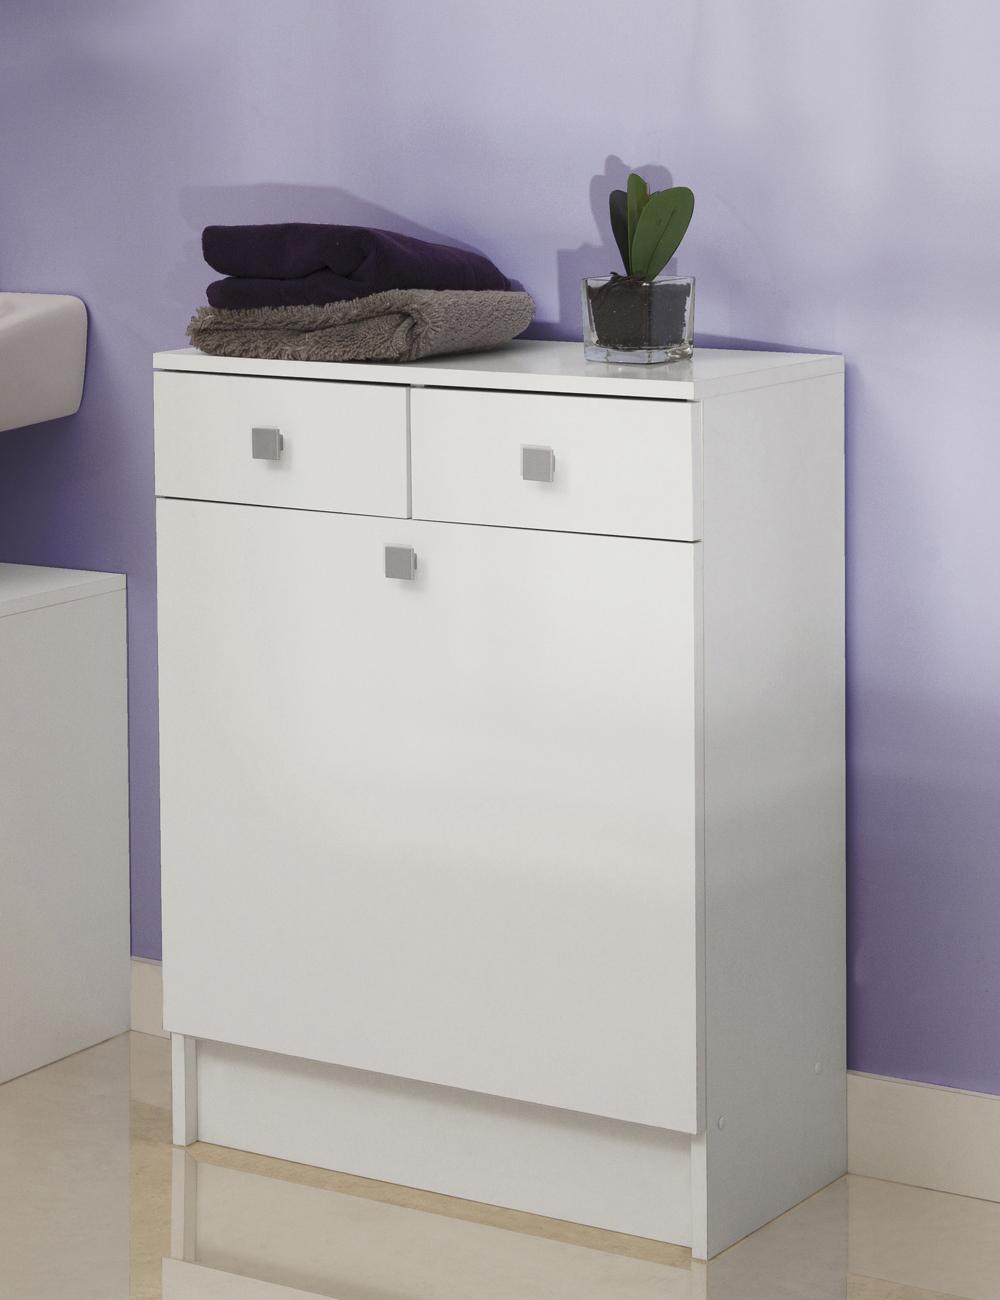 armoire linge sale avec sac int gr blanc. Black Bedroom Furniture Sets. Home Design Ideas